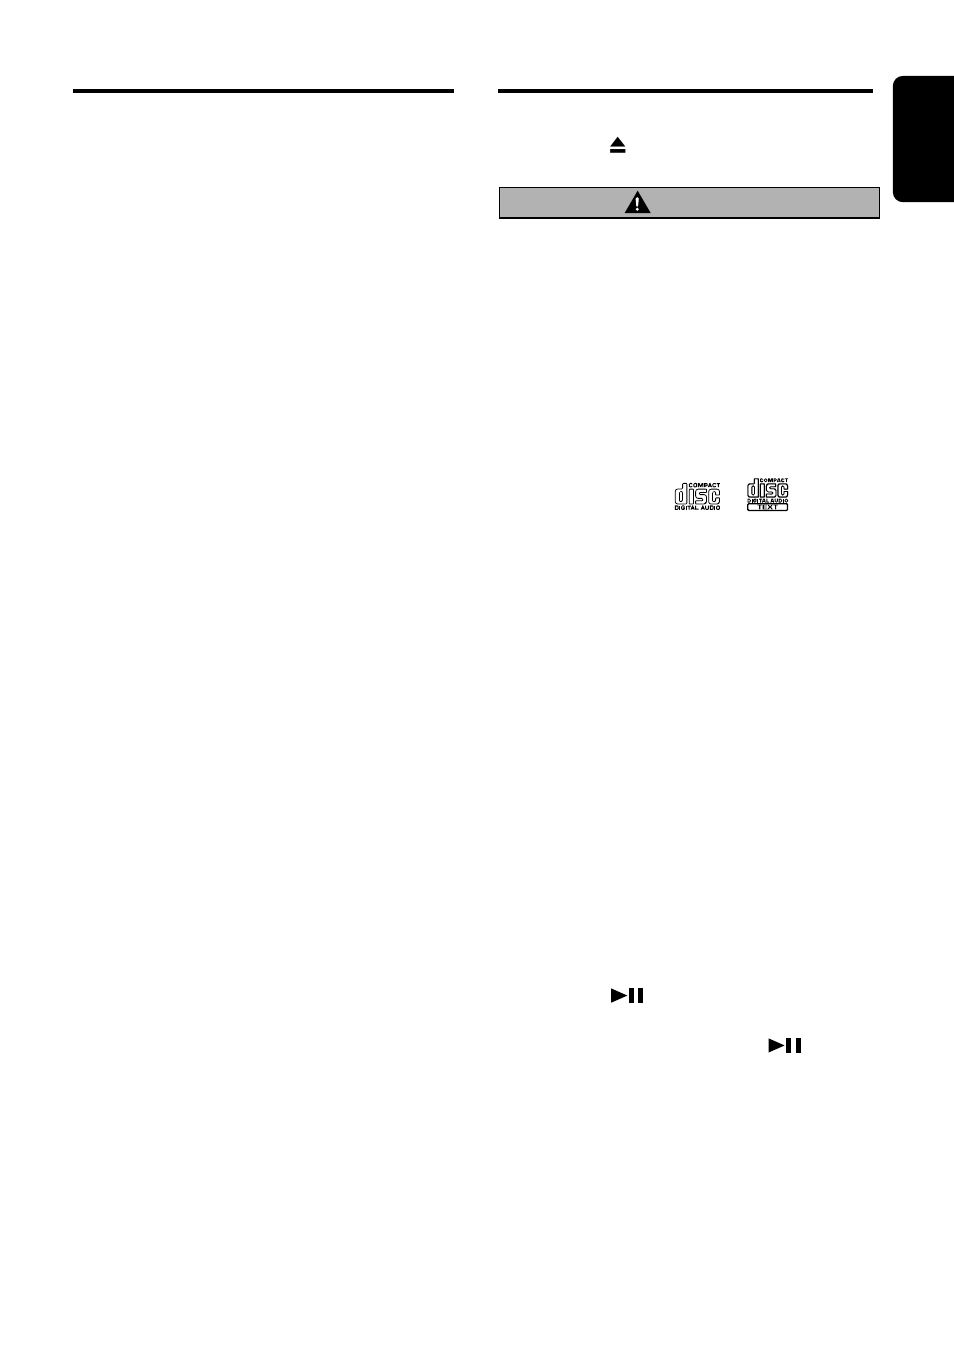 cd operations 17 english caution clarion dxz725 user manual rh manualsdir com